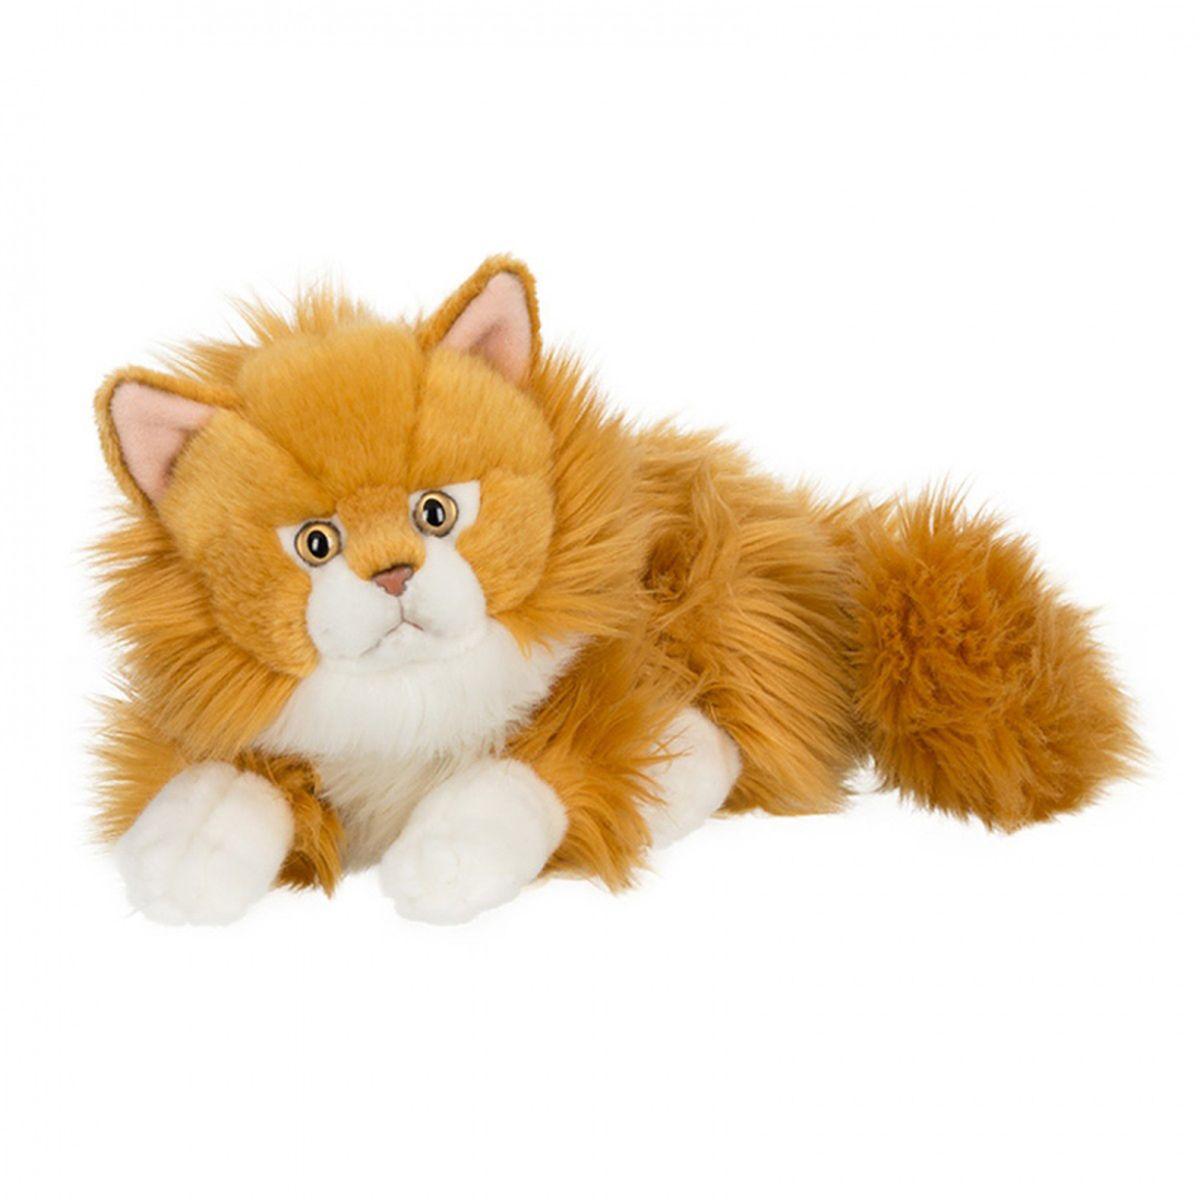 Anna Club Plush Кот сибирский рыжий, лежит 30 см anna club plush мягкая игрушка кот сибирский серый 25 см